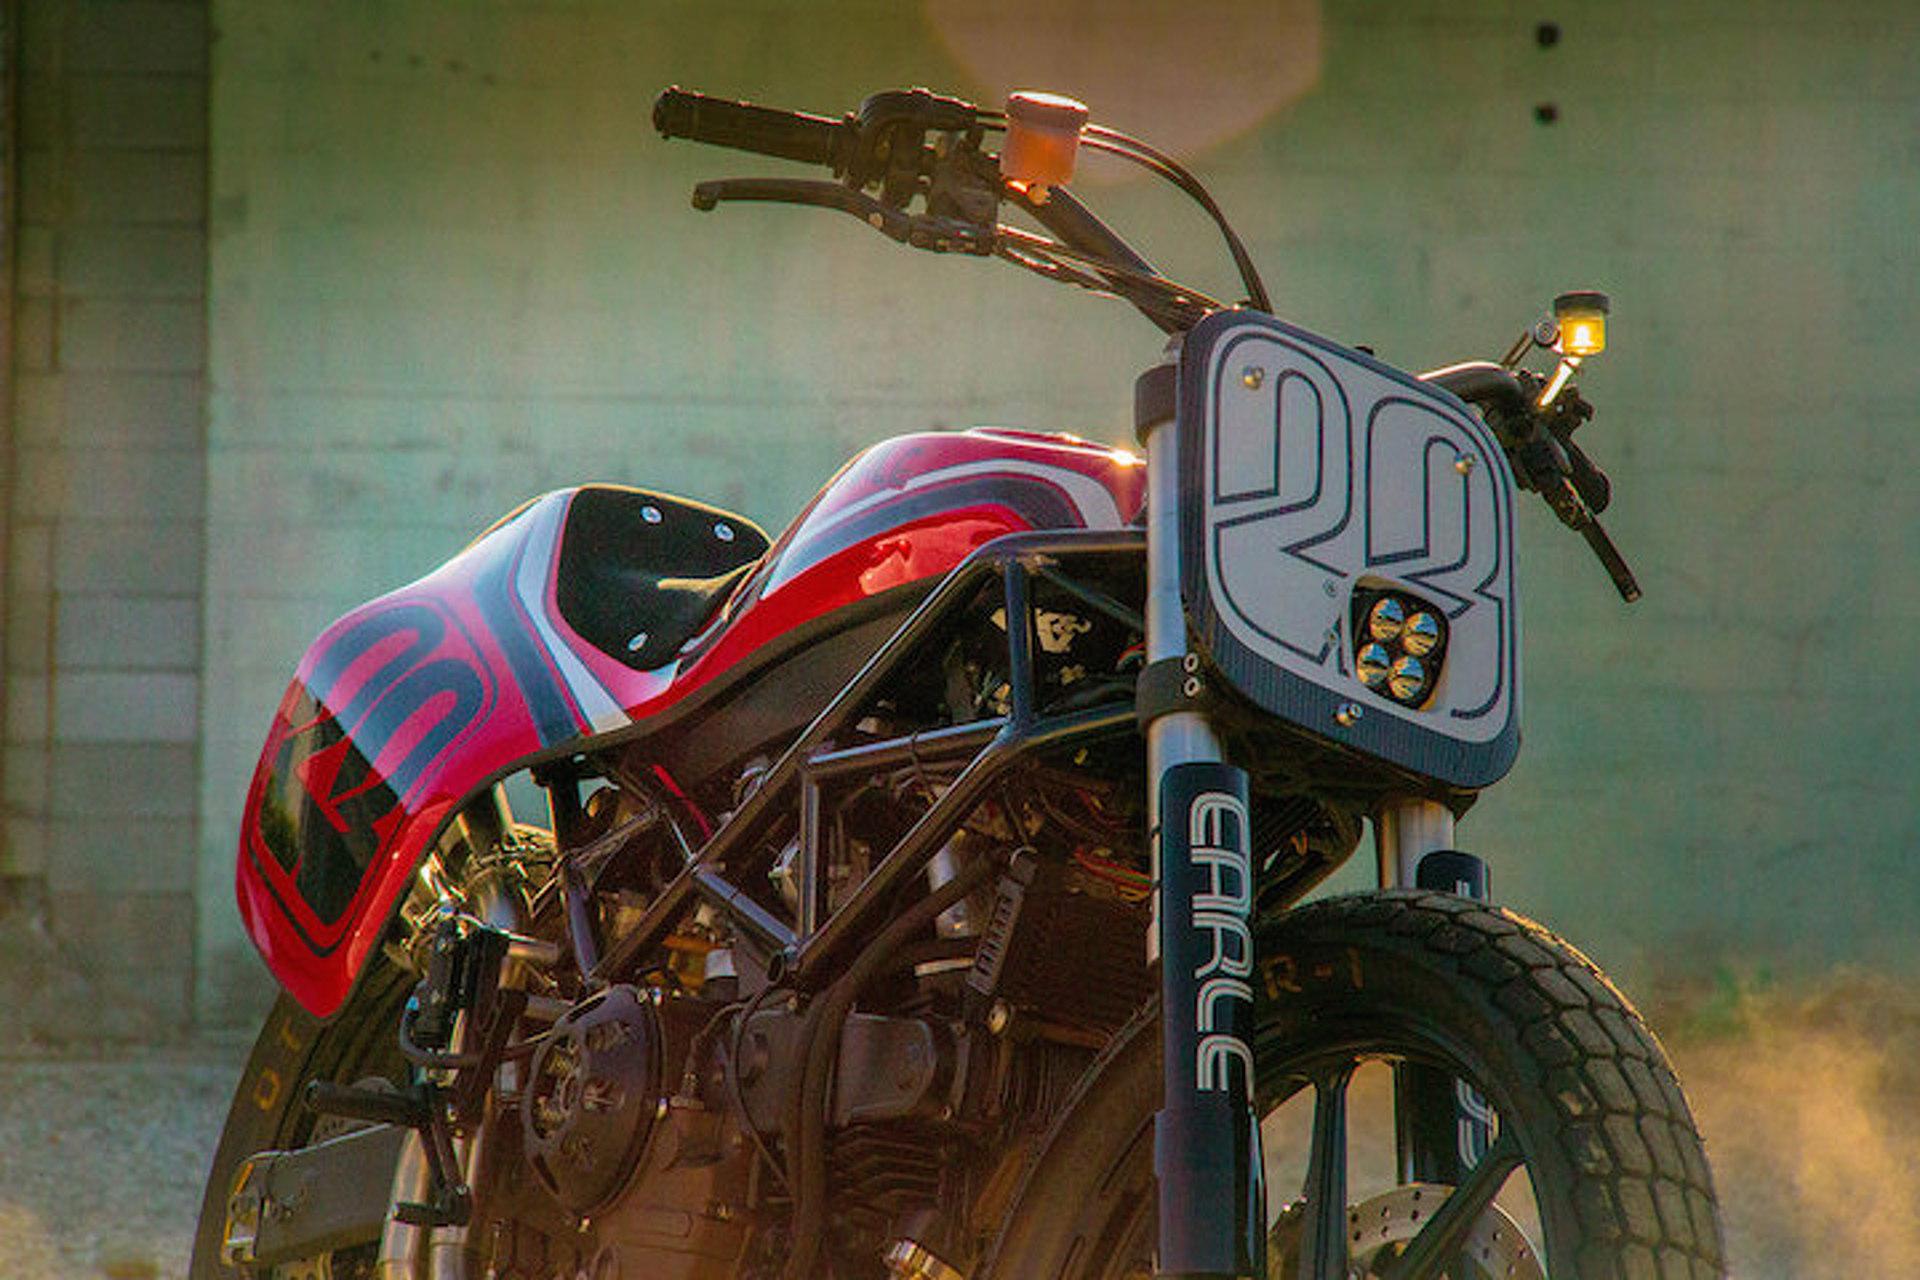 One Volkswagen Designer Created a Custom Ducati Worth Swooning Over